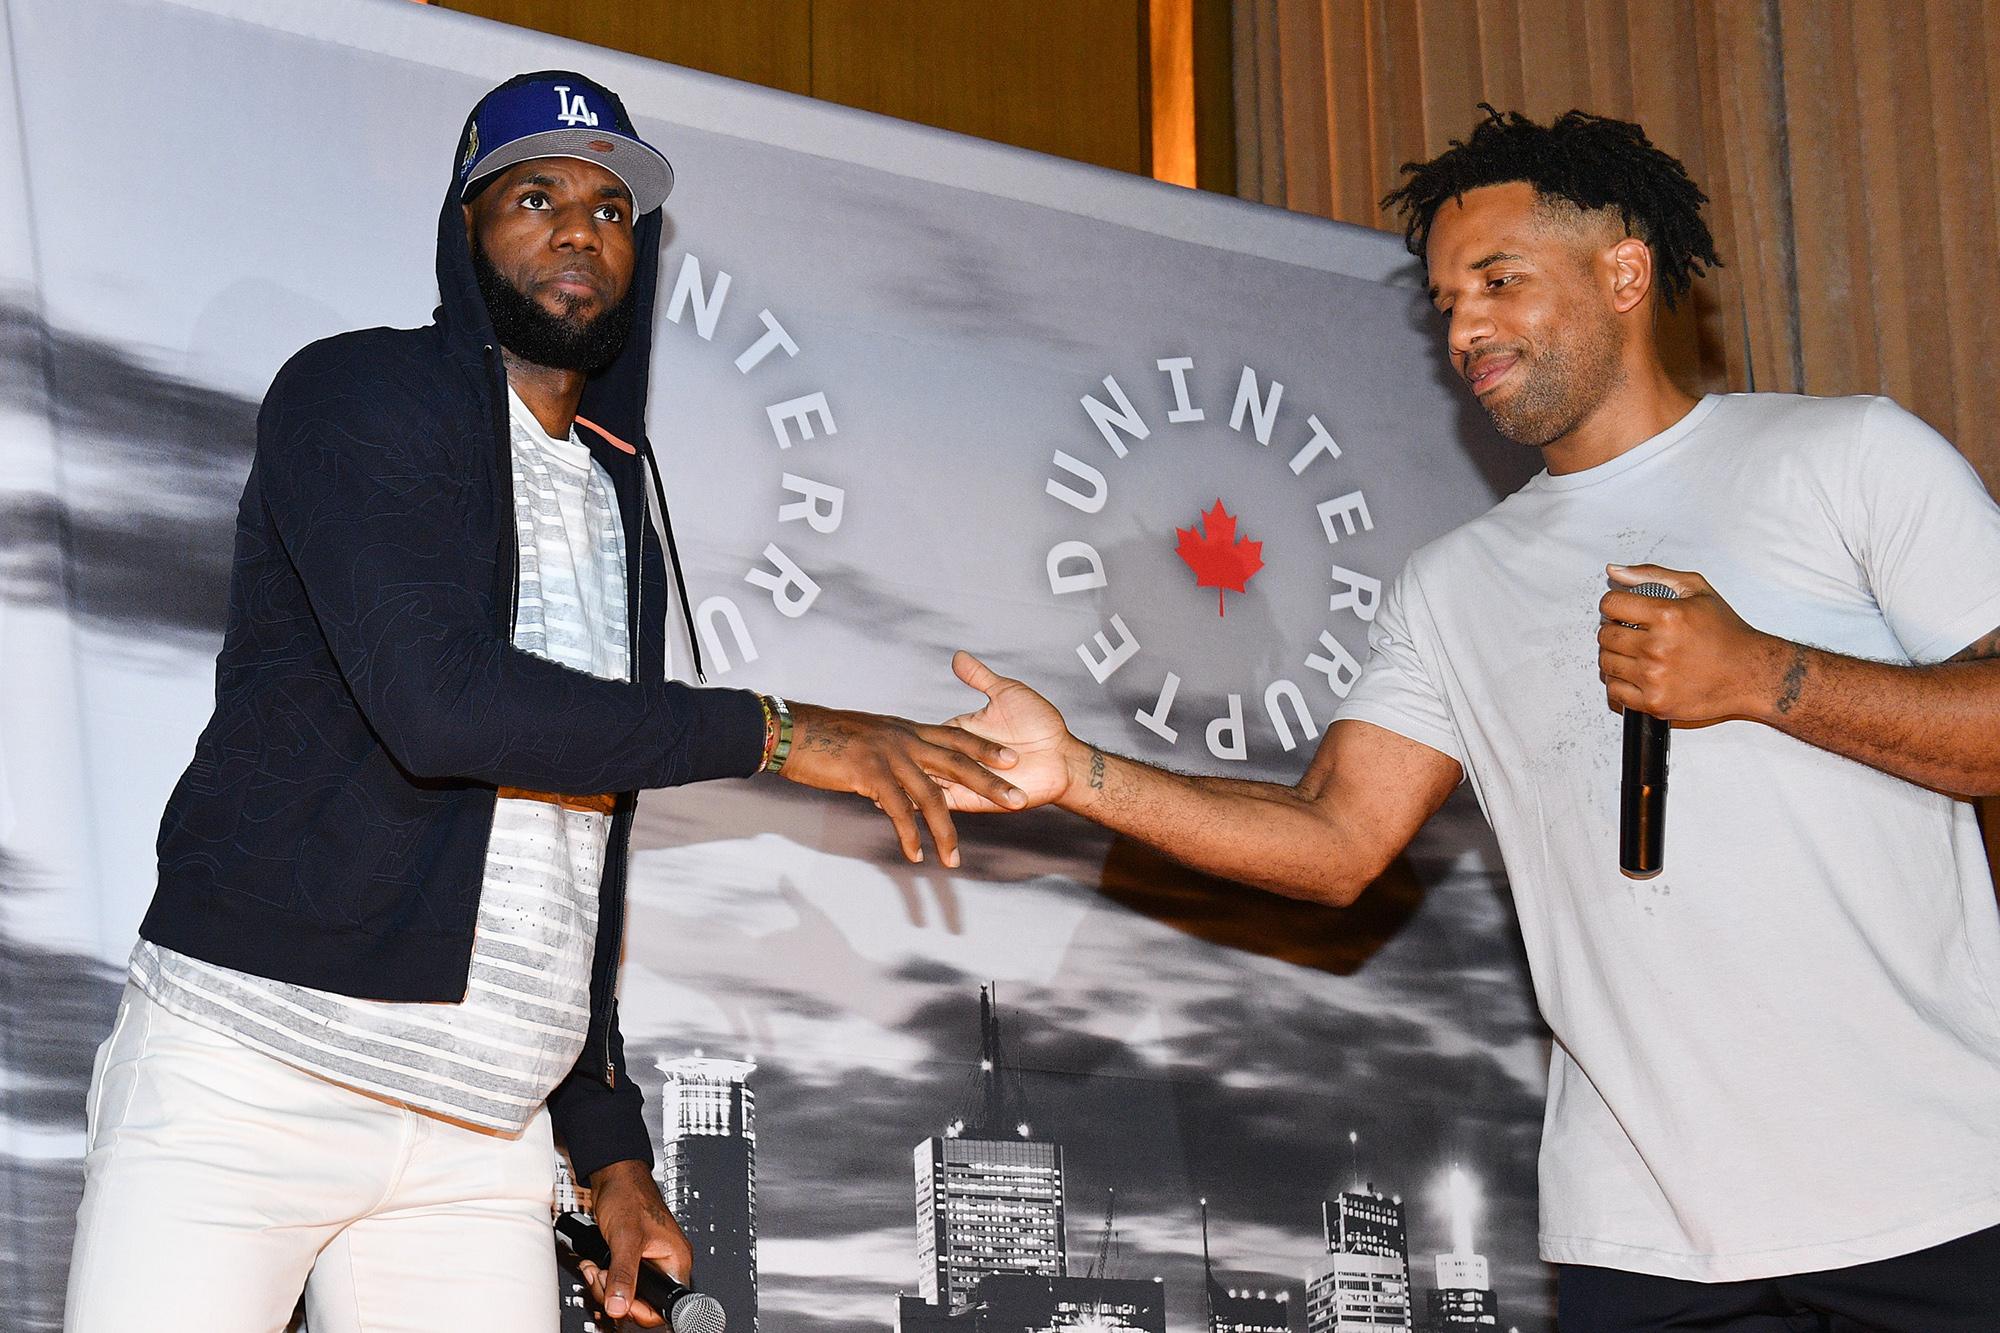 LeBron James, Maverick Carter raise